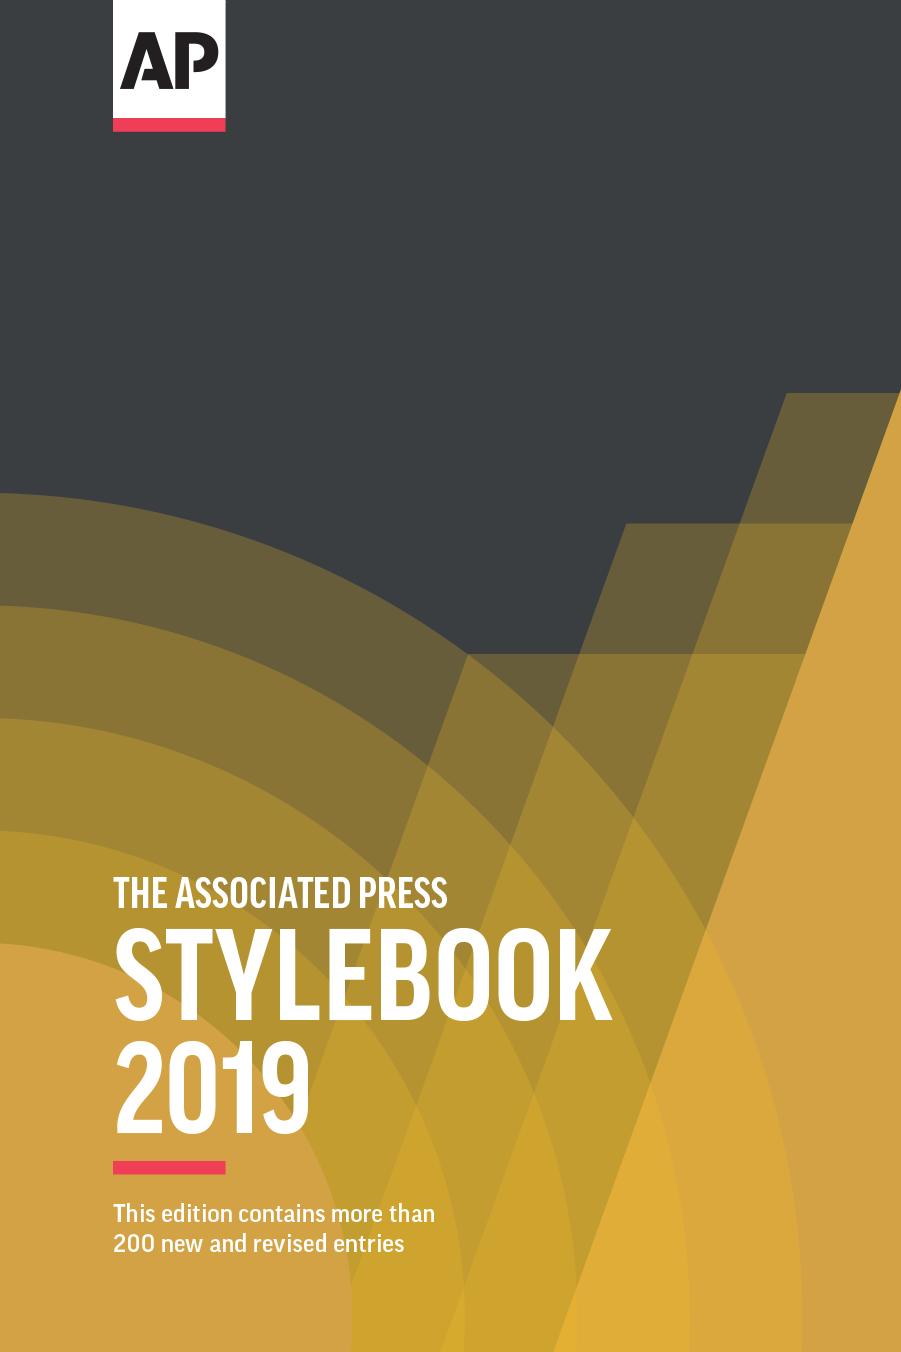 2019 AP Stylebook (print edition)